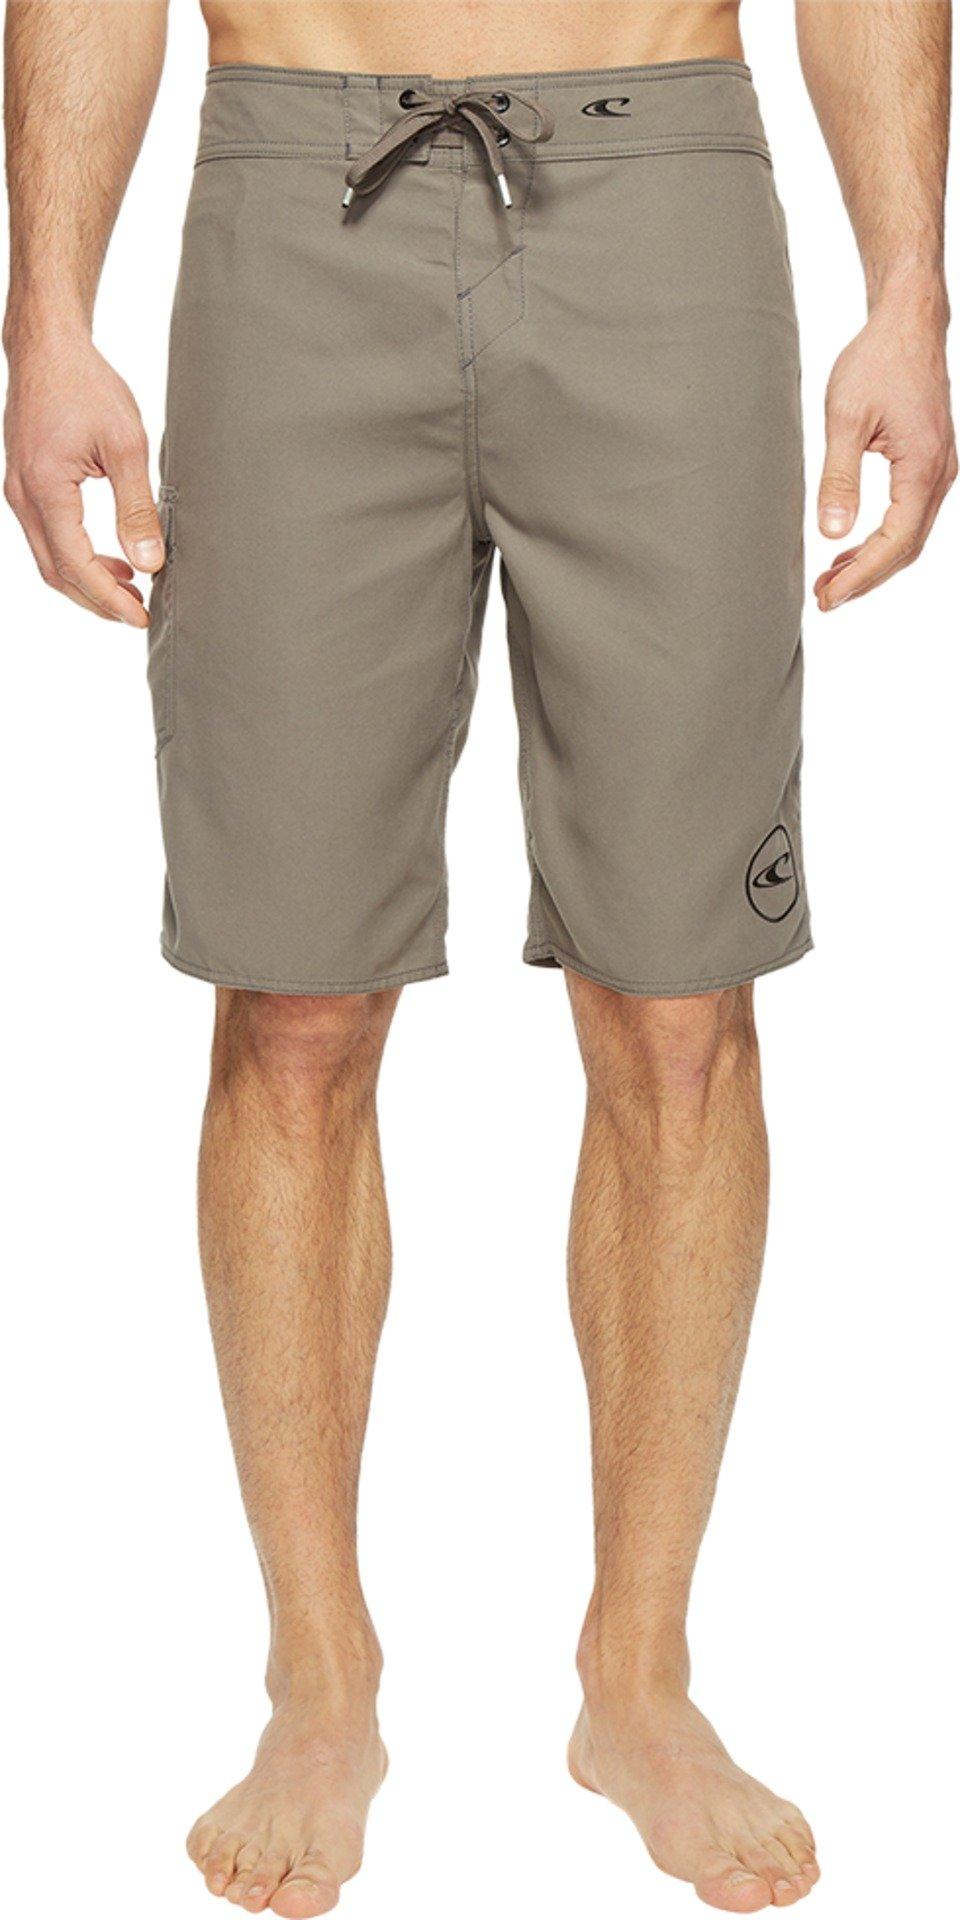 O'Neill Men's Santa Cruz Solid 2.0 Boardshorts Charcoal Swimsuit Bottoms